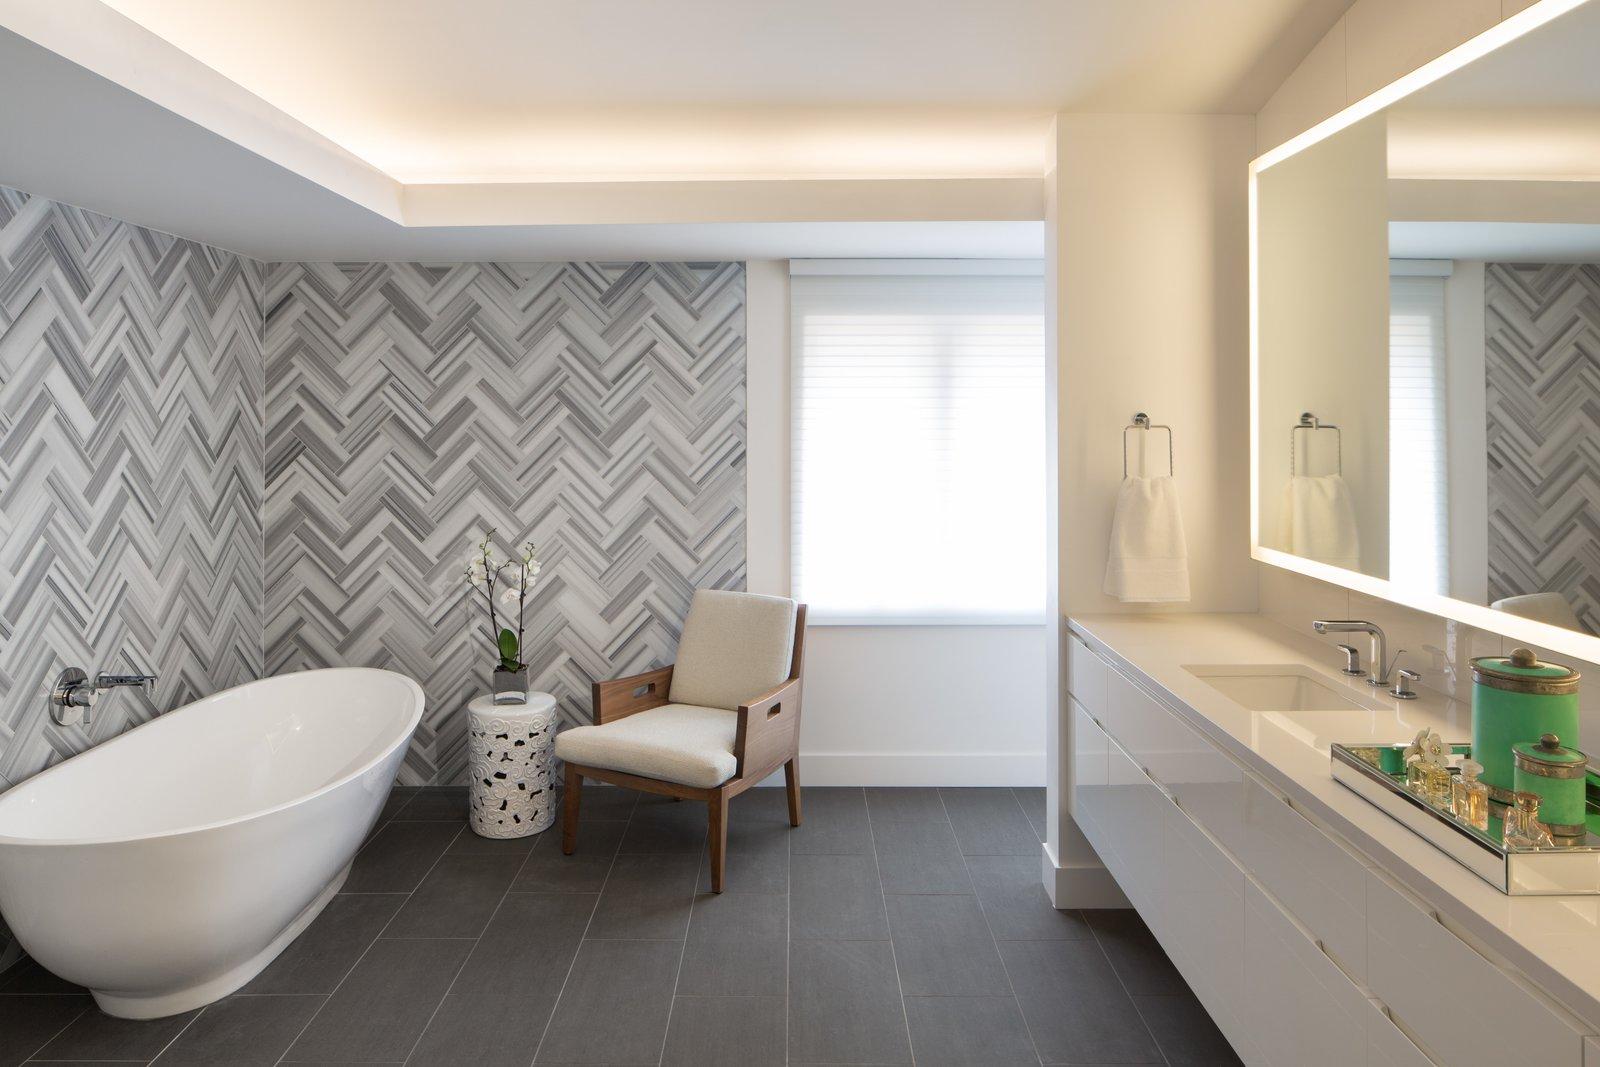 Bath Room, Engineered Quartz Counter, Porcelain Tile Floor, Undermount Sink, Accent Lighting, Freestanding Tub, and Stone Tile Wall Master Bathroom Suite  Donner Residence by Design Platform